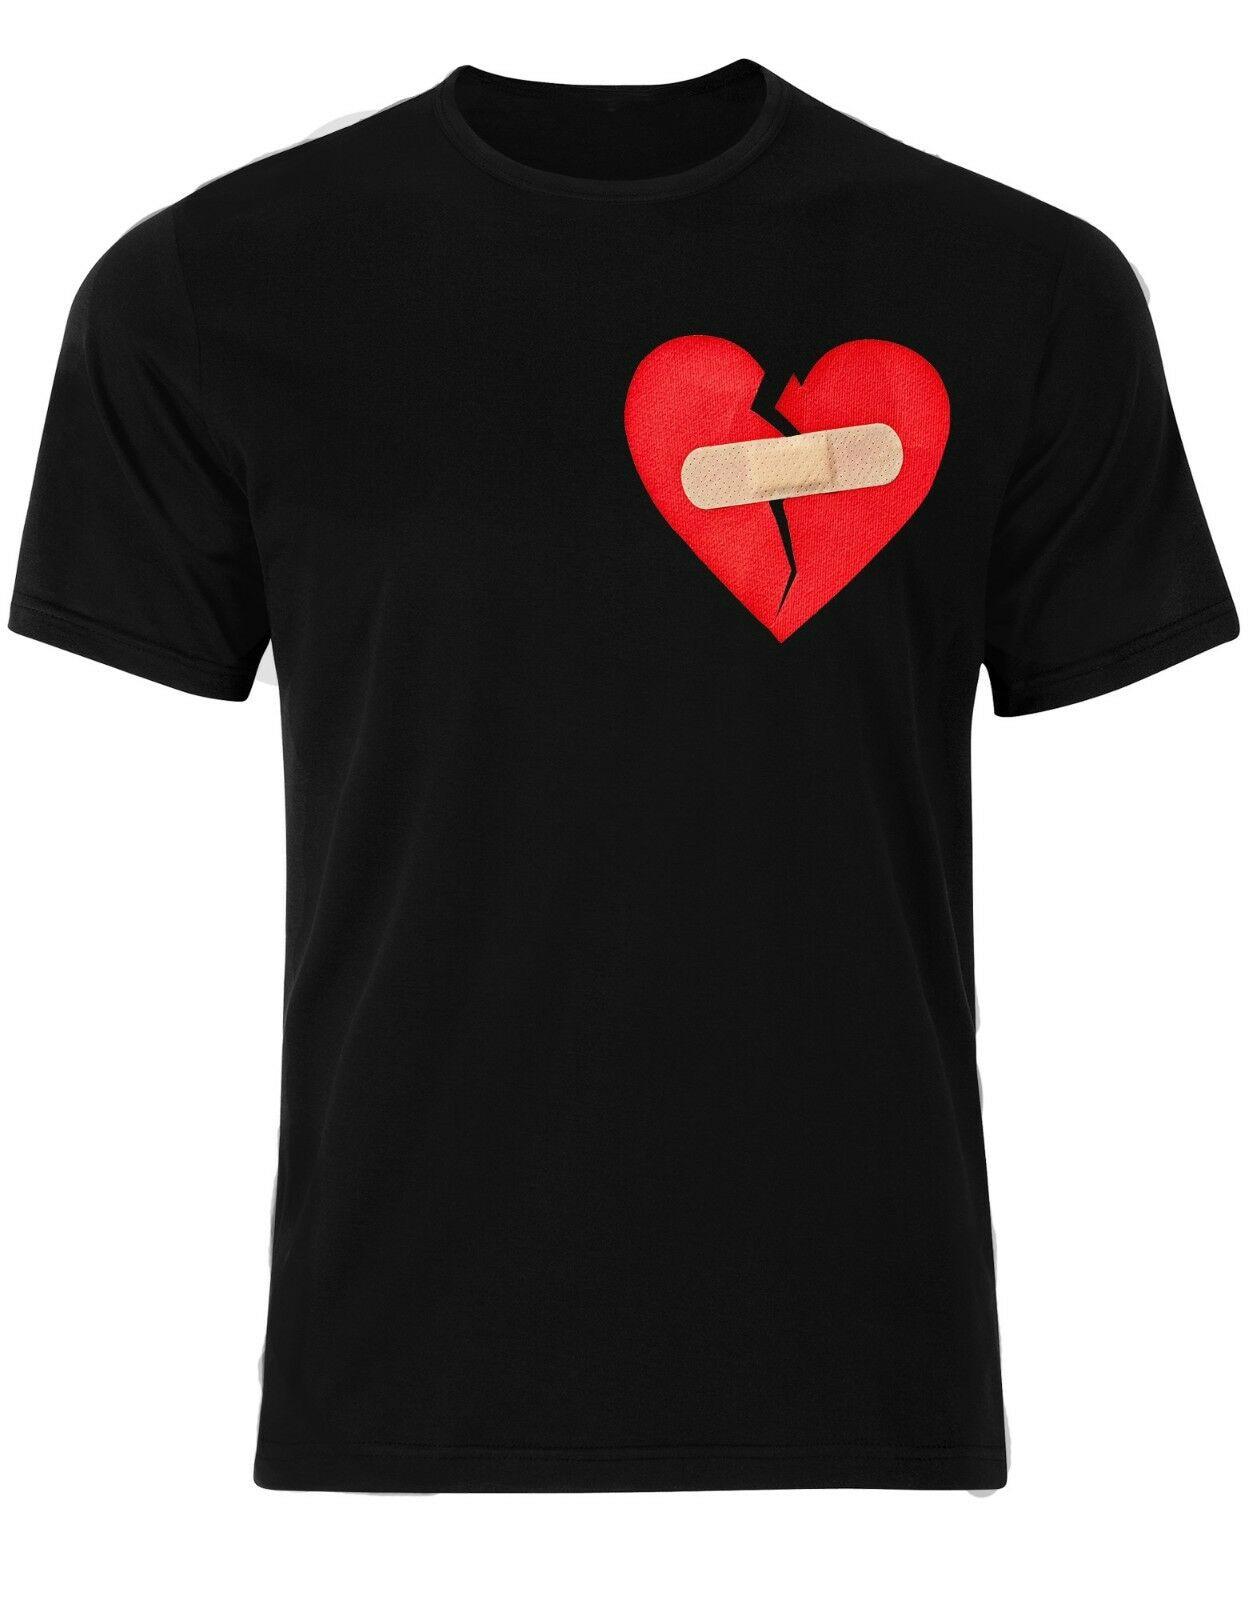 Camiseta de manga corta para hombre Anti San Valentín 14 vida única divertida amor Banda-aid Corazón Roto